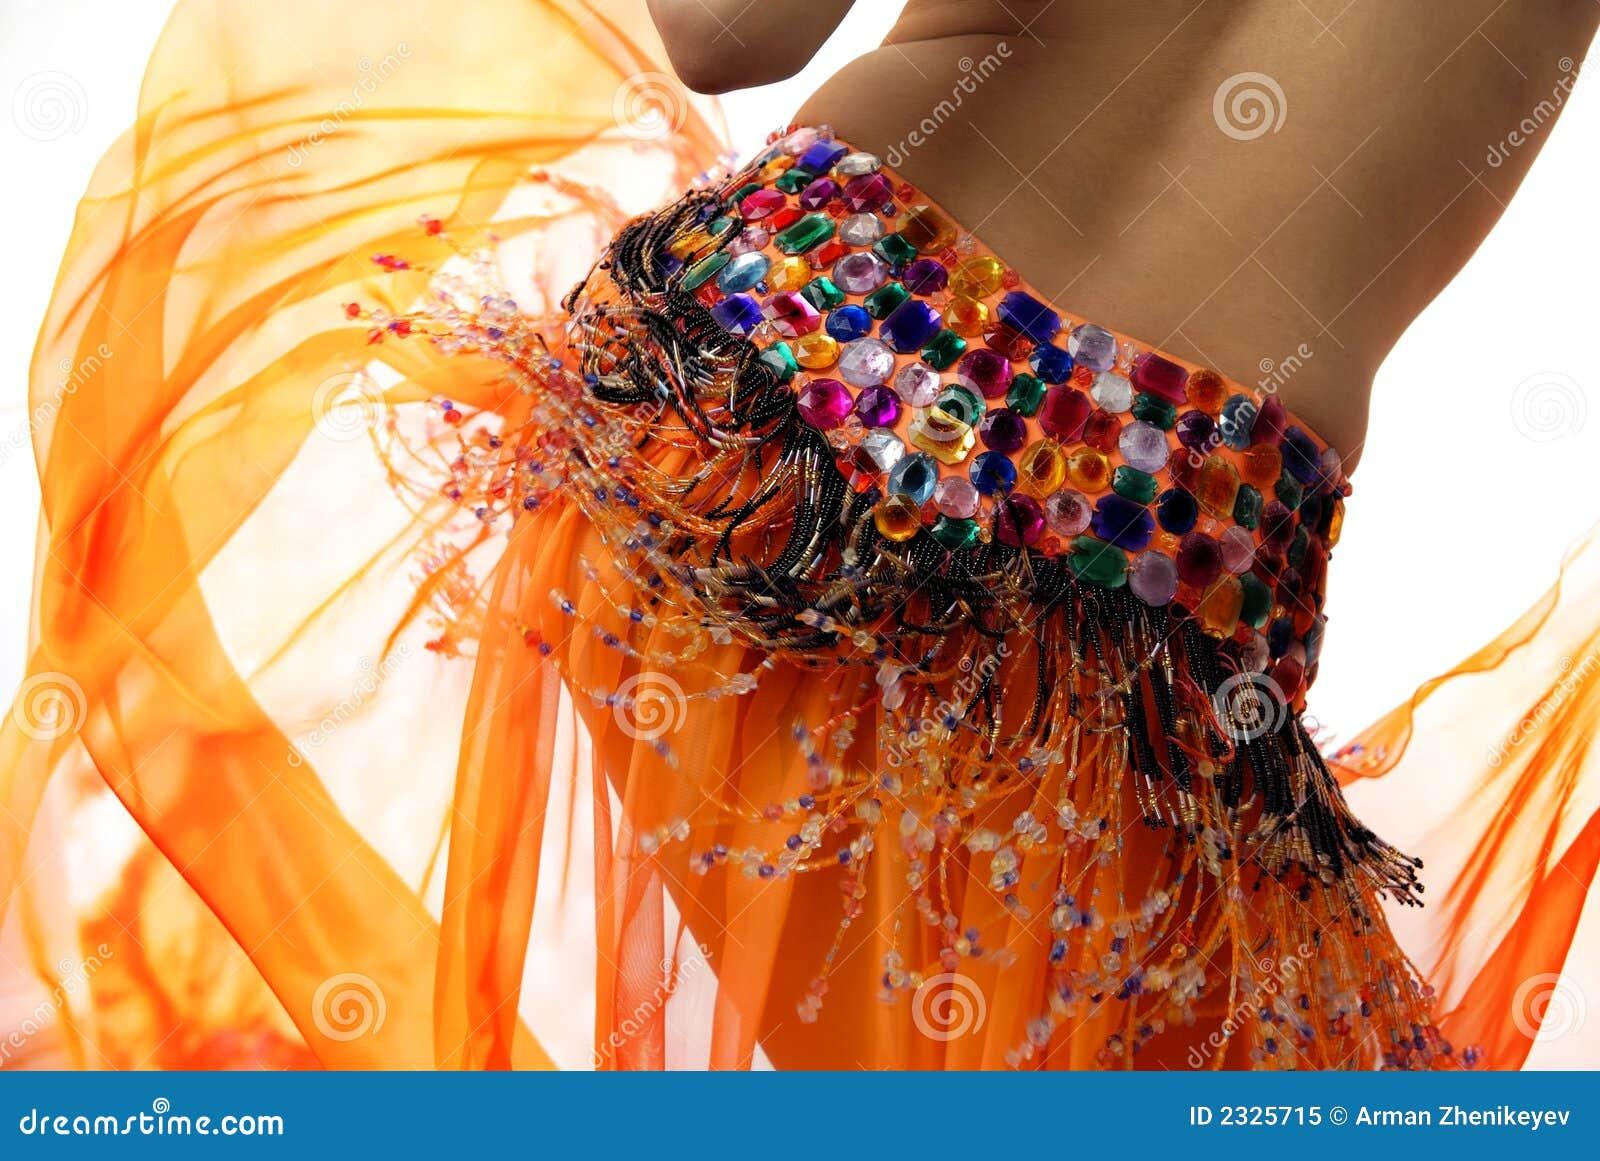 Danseur de ventre orange